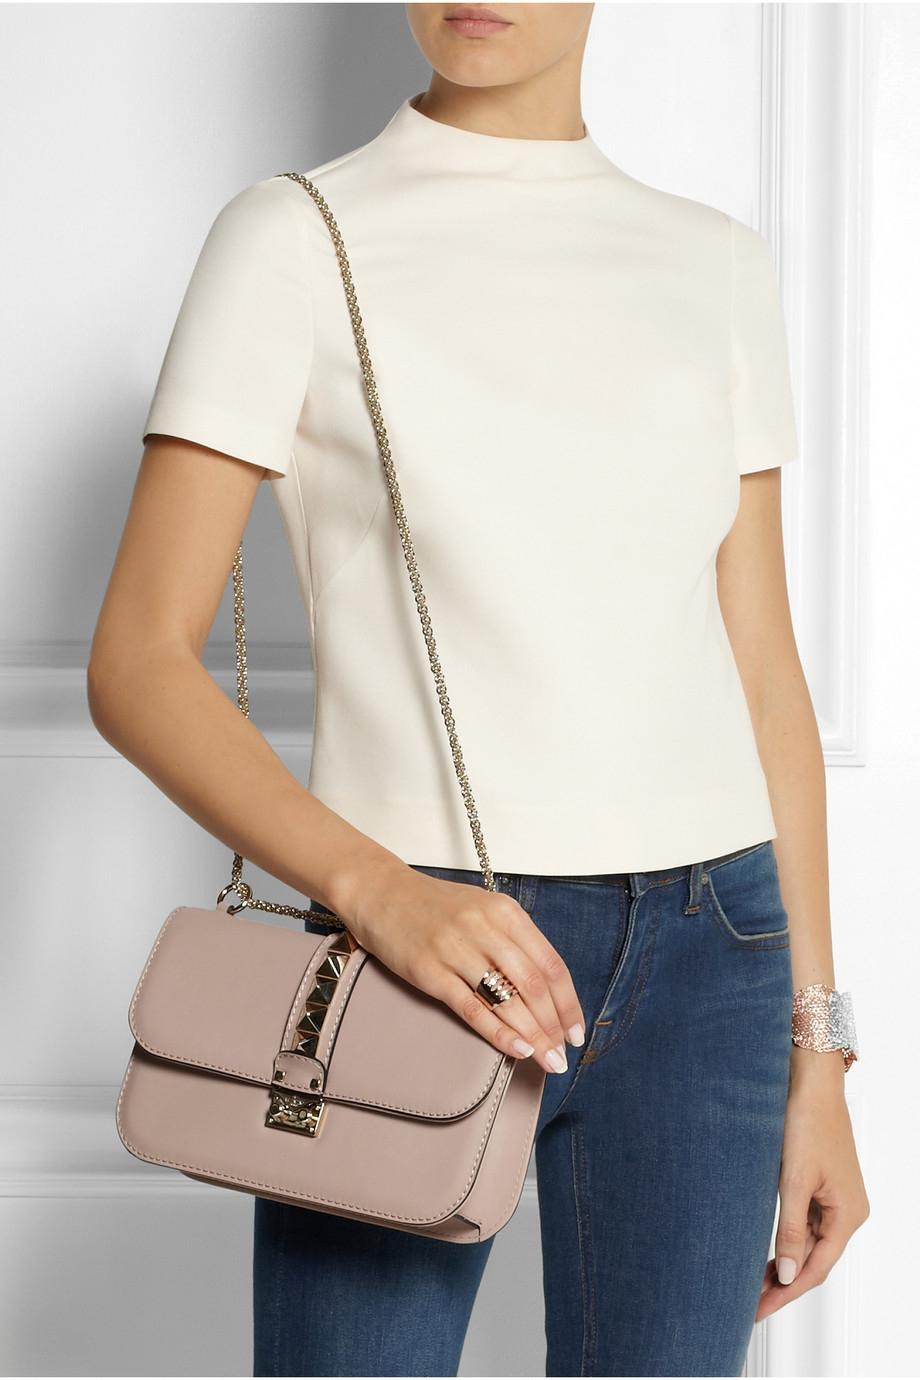 Valentino Women's Shoulder Bags | Valentino Garavani